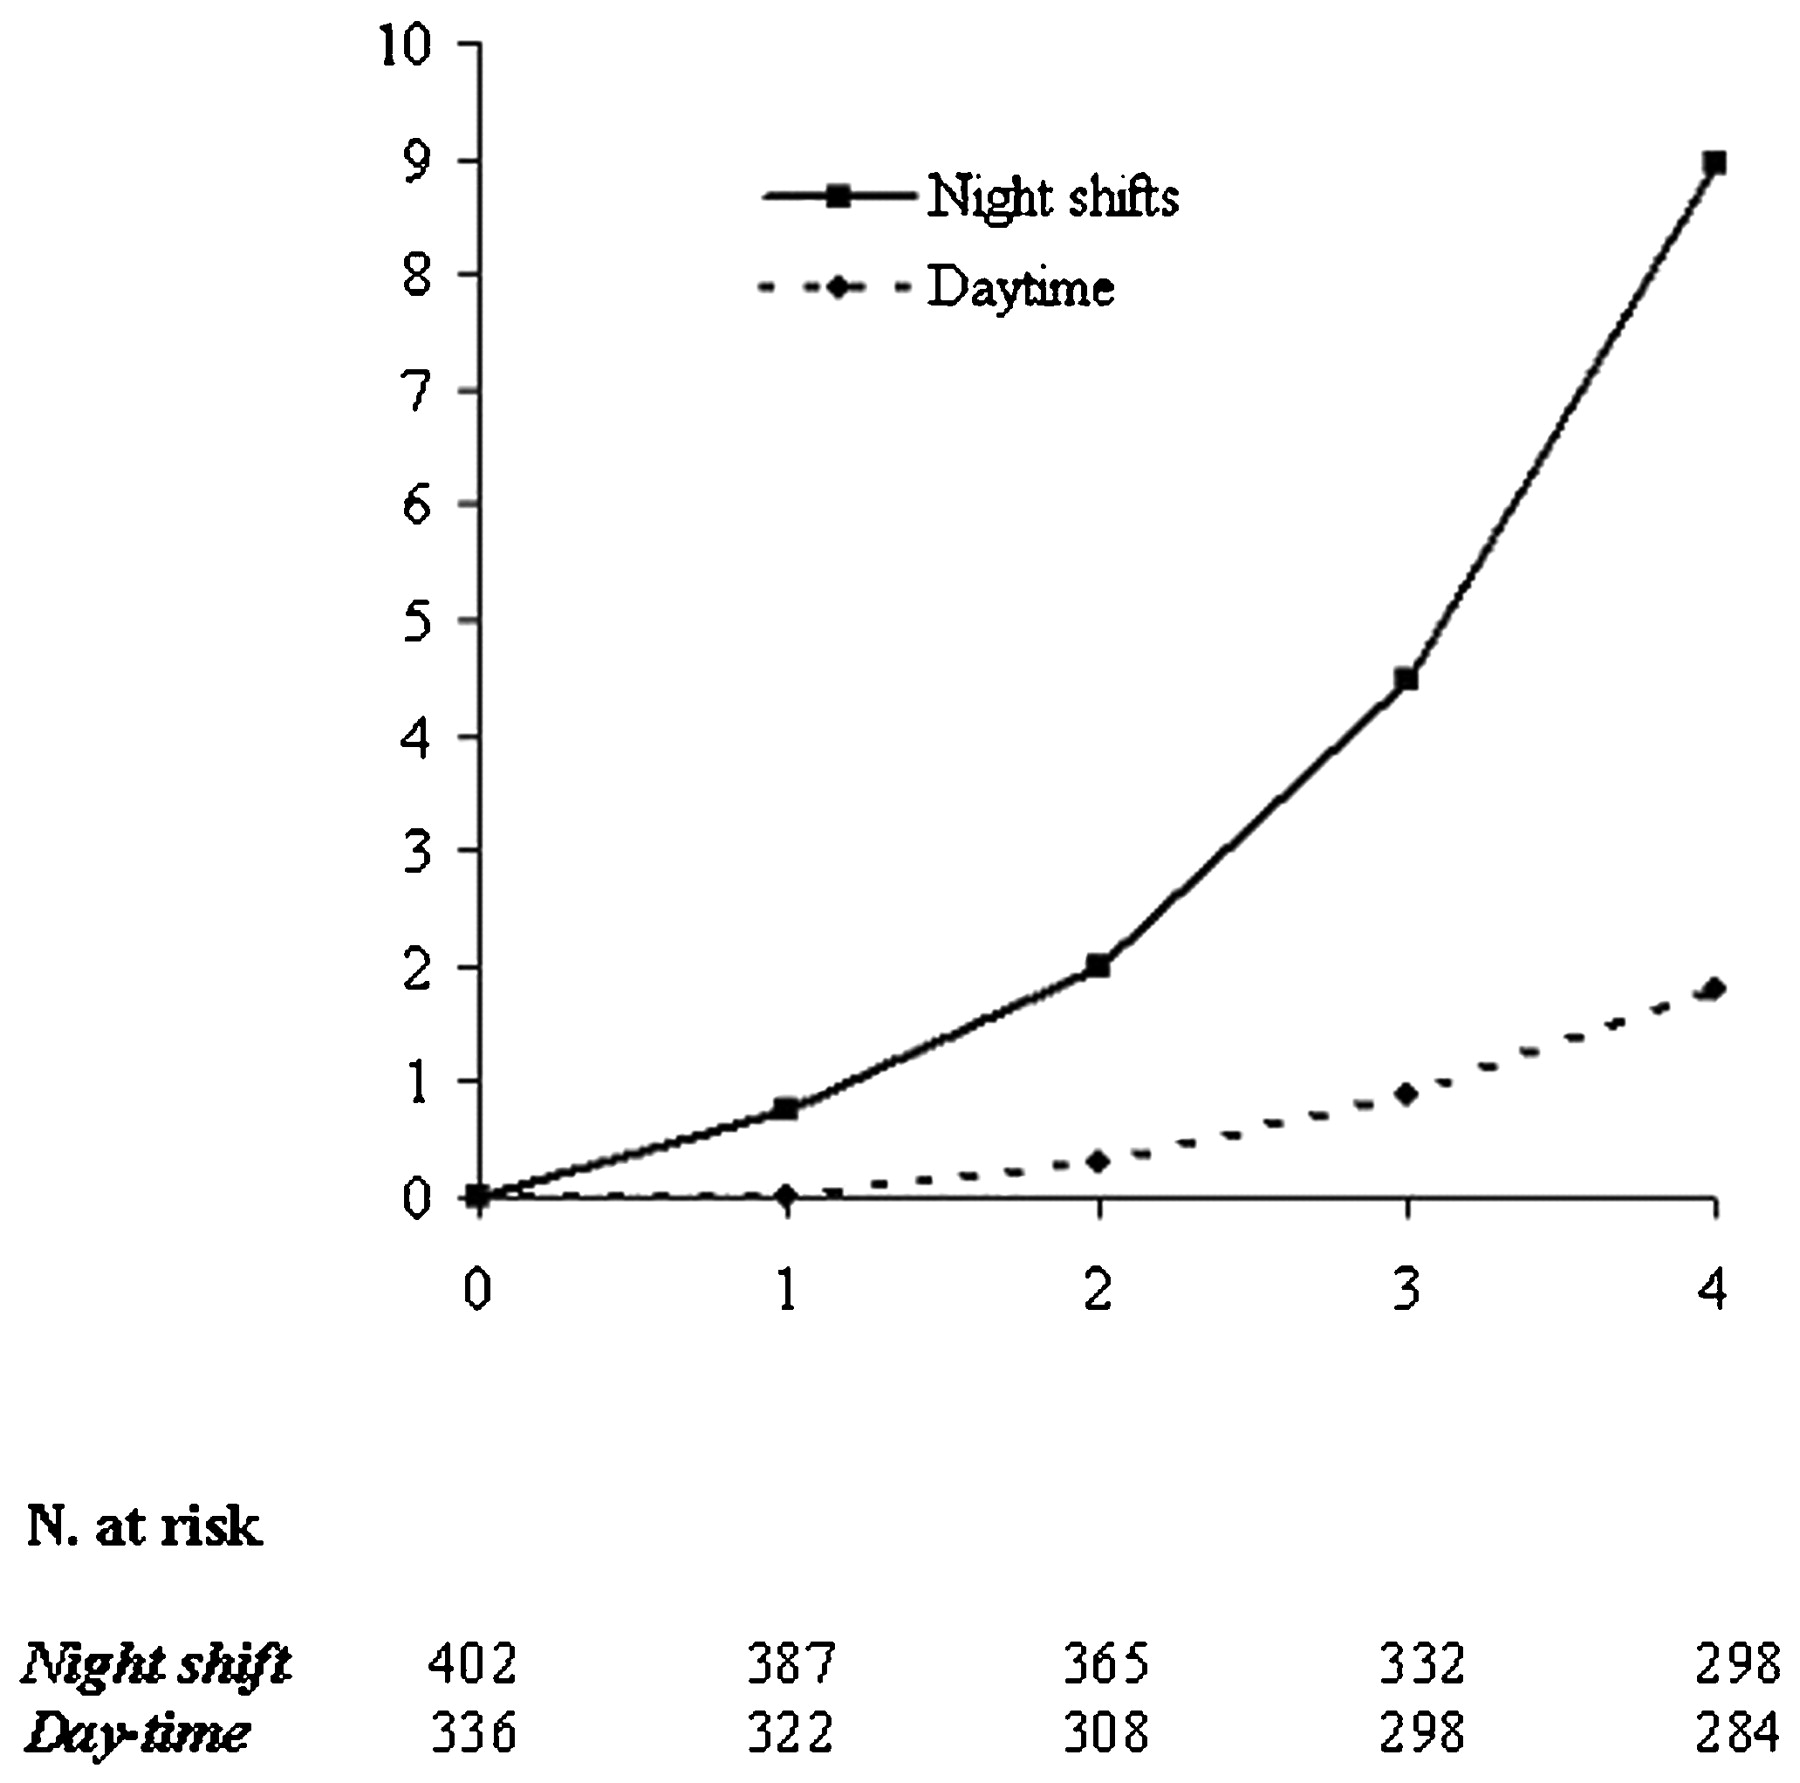 Incidence of metabolic syndrome among night-shift